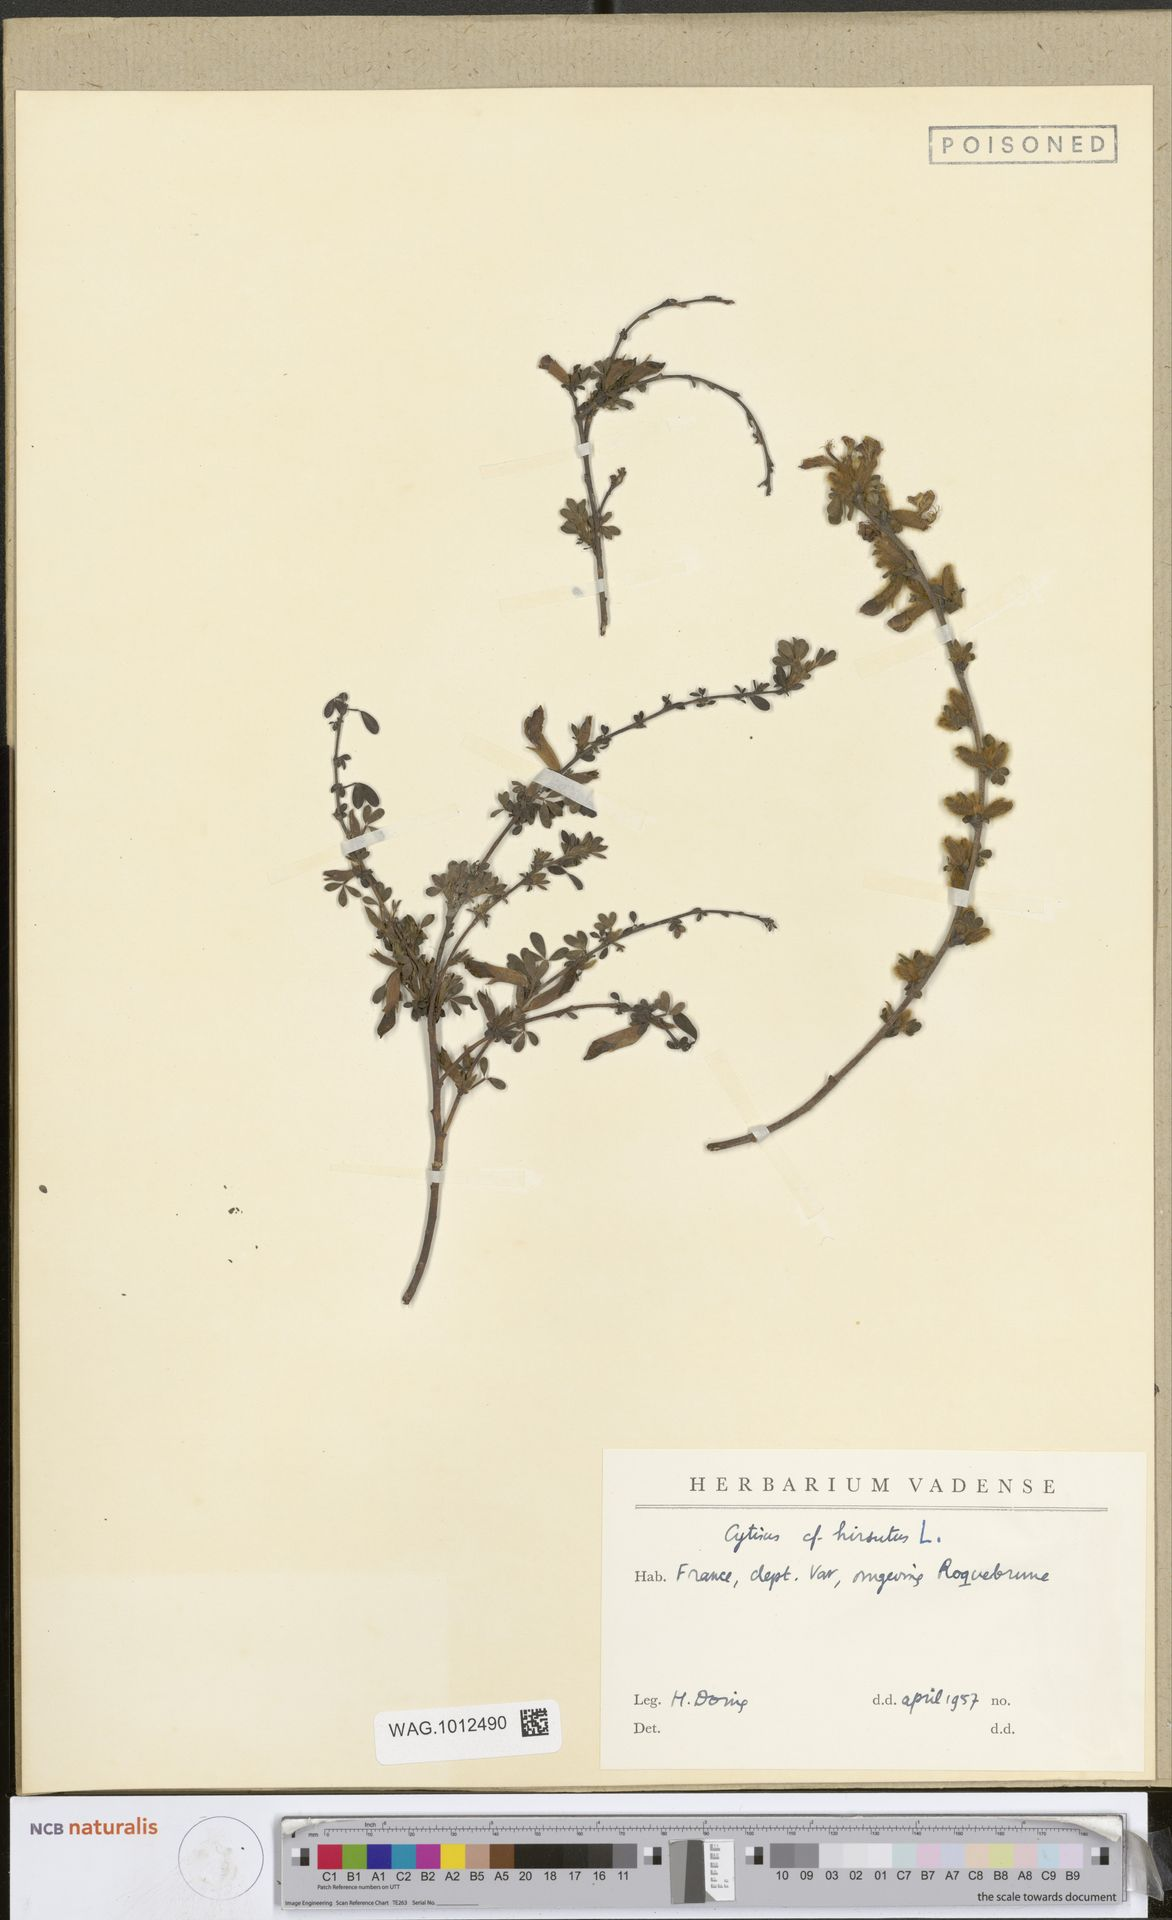 WAG.1012490 | Cytisus hirsutus L.